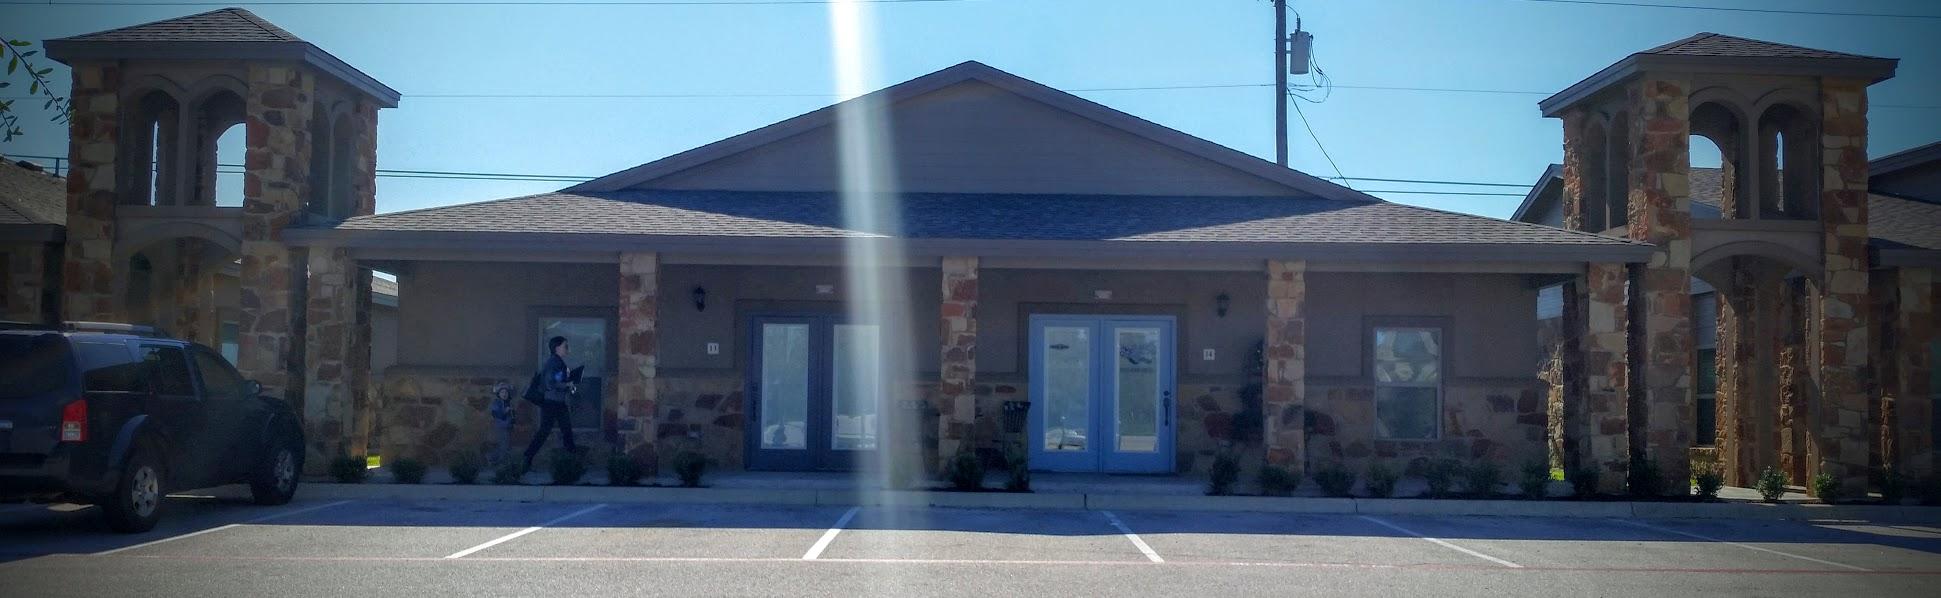 4REELZ School of Film - 2851 Joe DiMaggio Blvd, Suite 13 - Round Rock, TX 78665